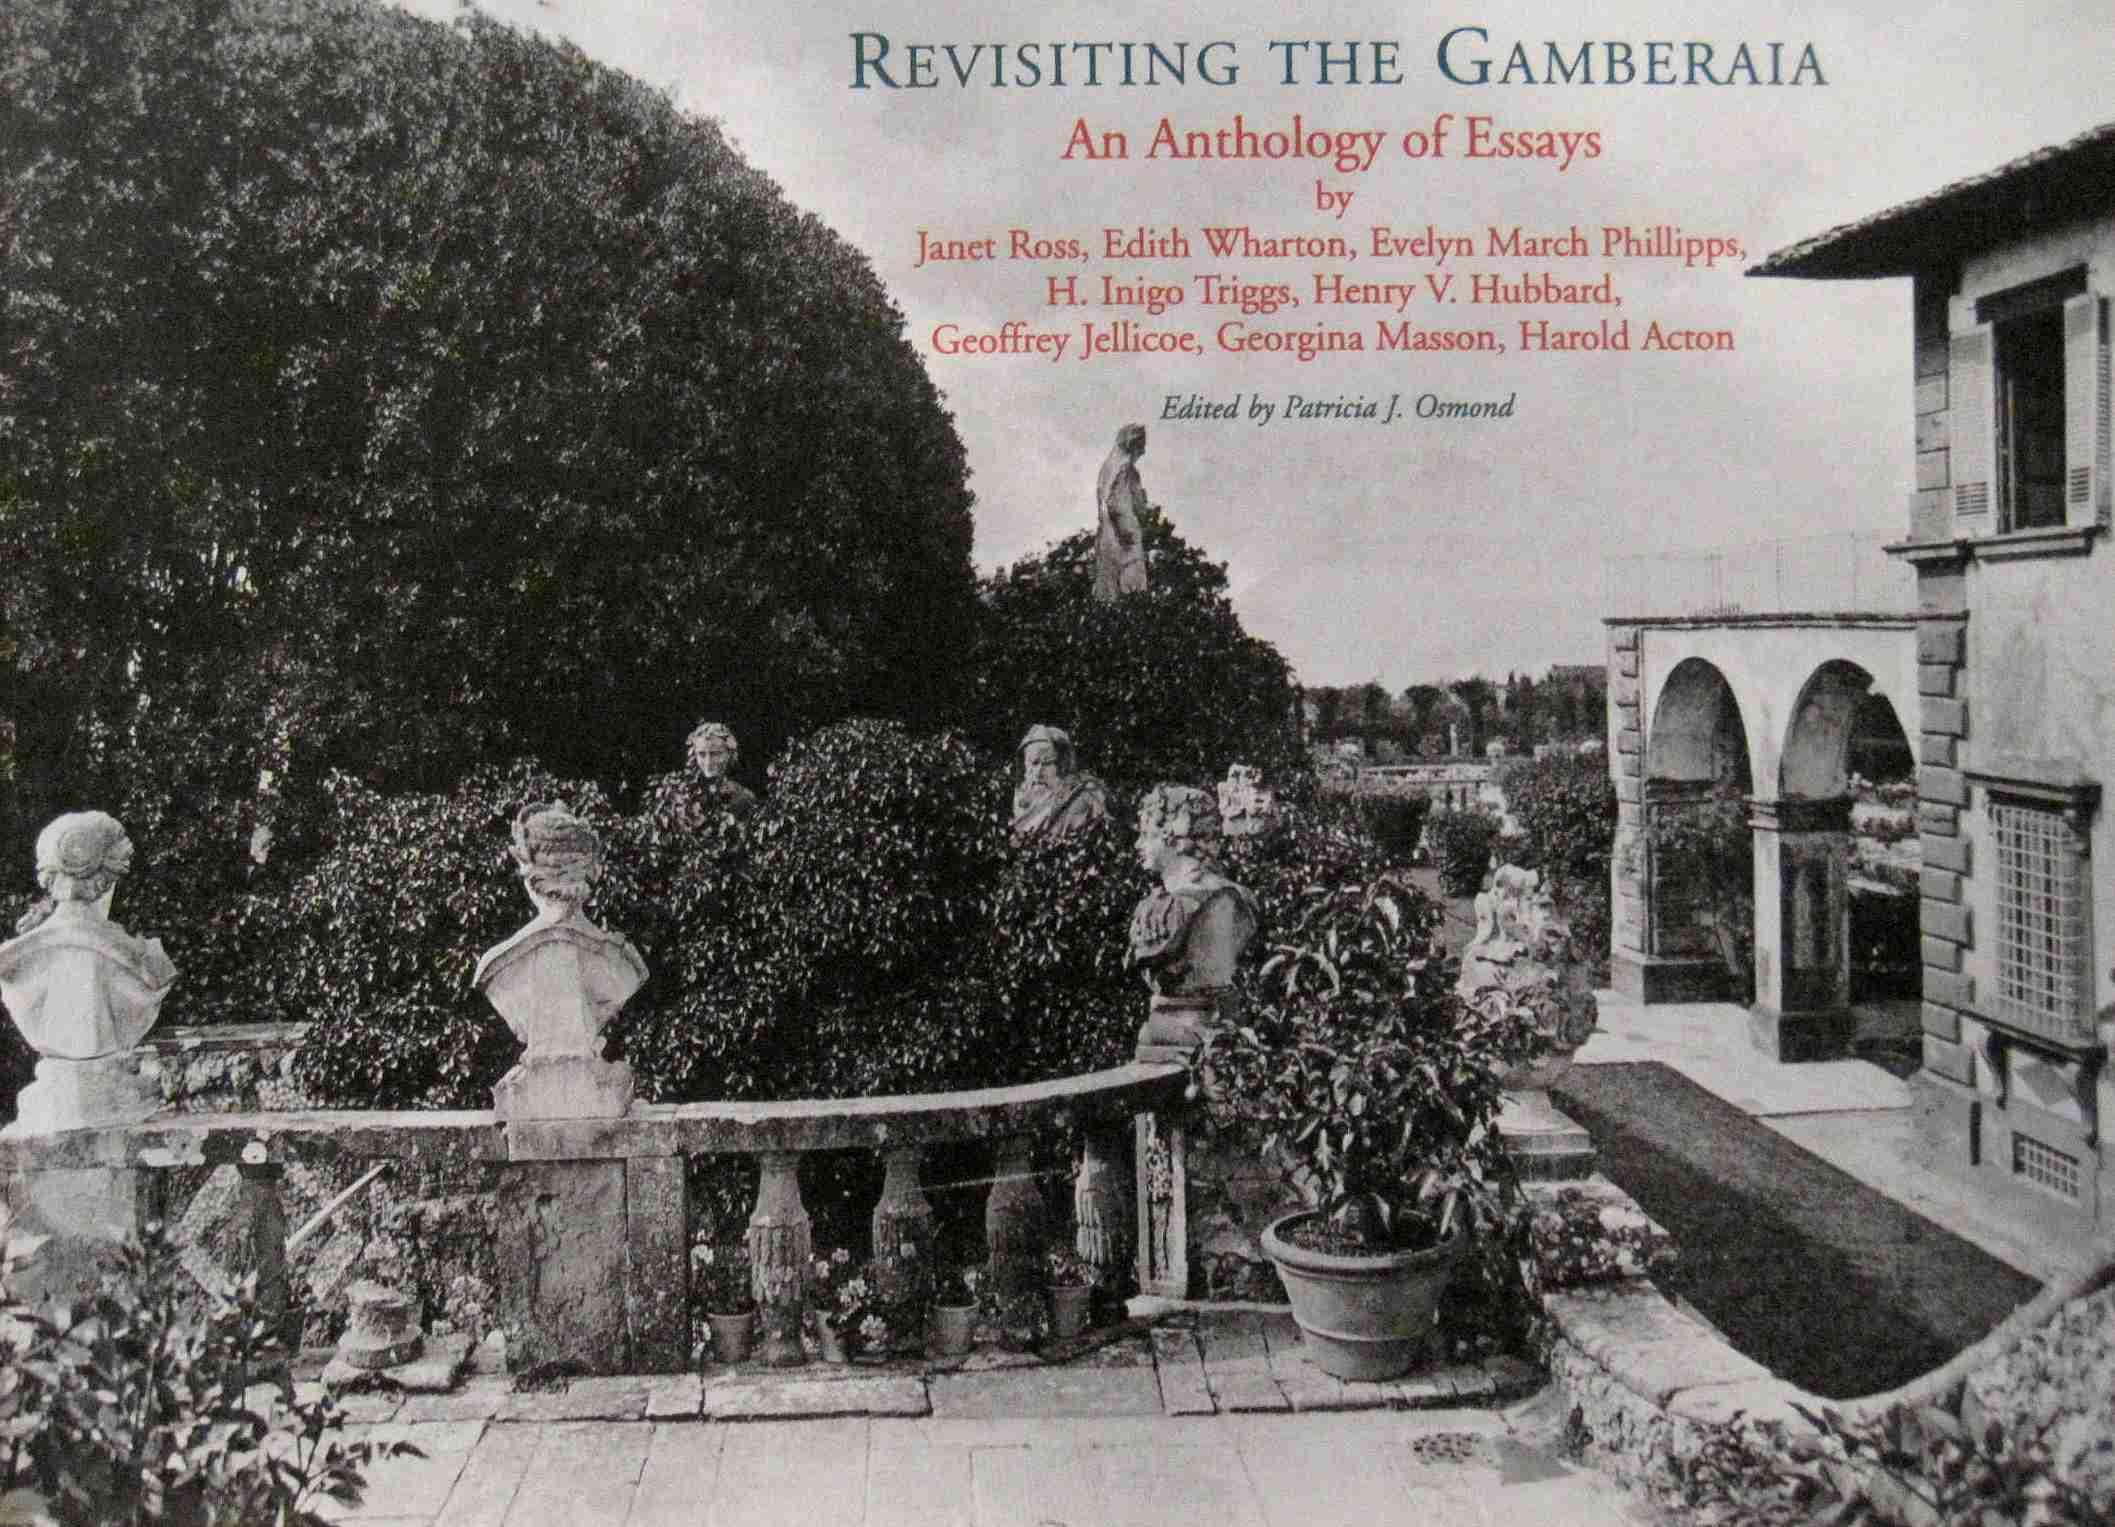 Revisiting the Gamberaia